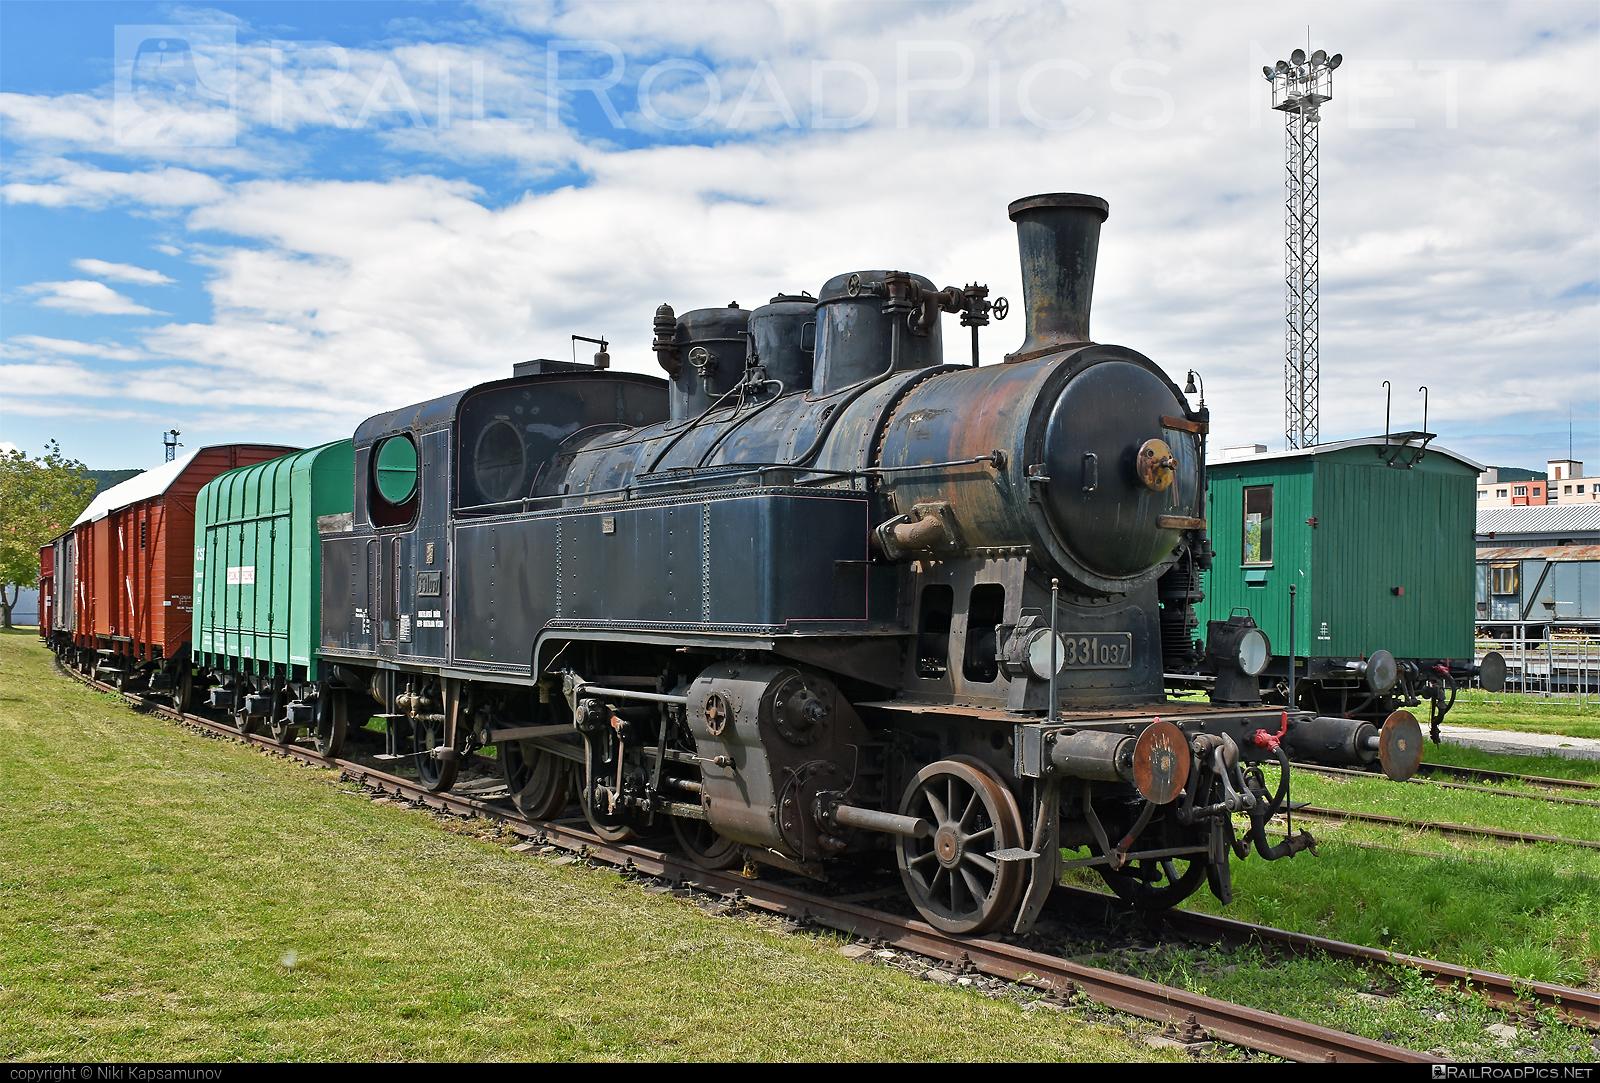 MÁVAG Class 375 - 331.037 operated by Železnice Slovenskej Republiky #mavag #mavag375 #mavagclass375 #zelezniceslovenskejrepubliky #zsr